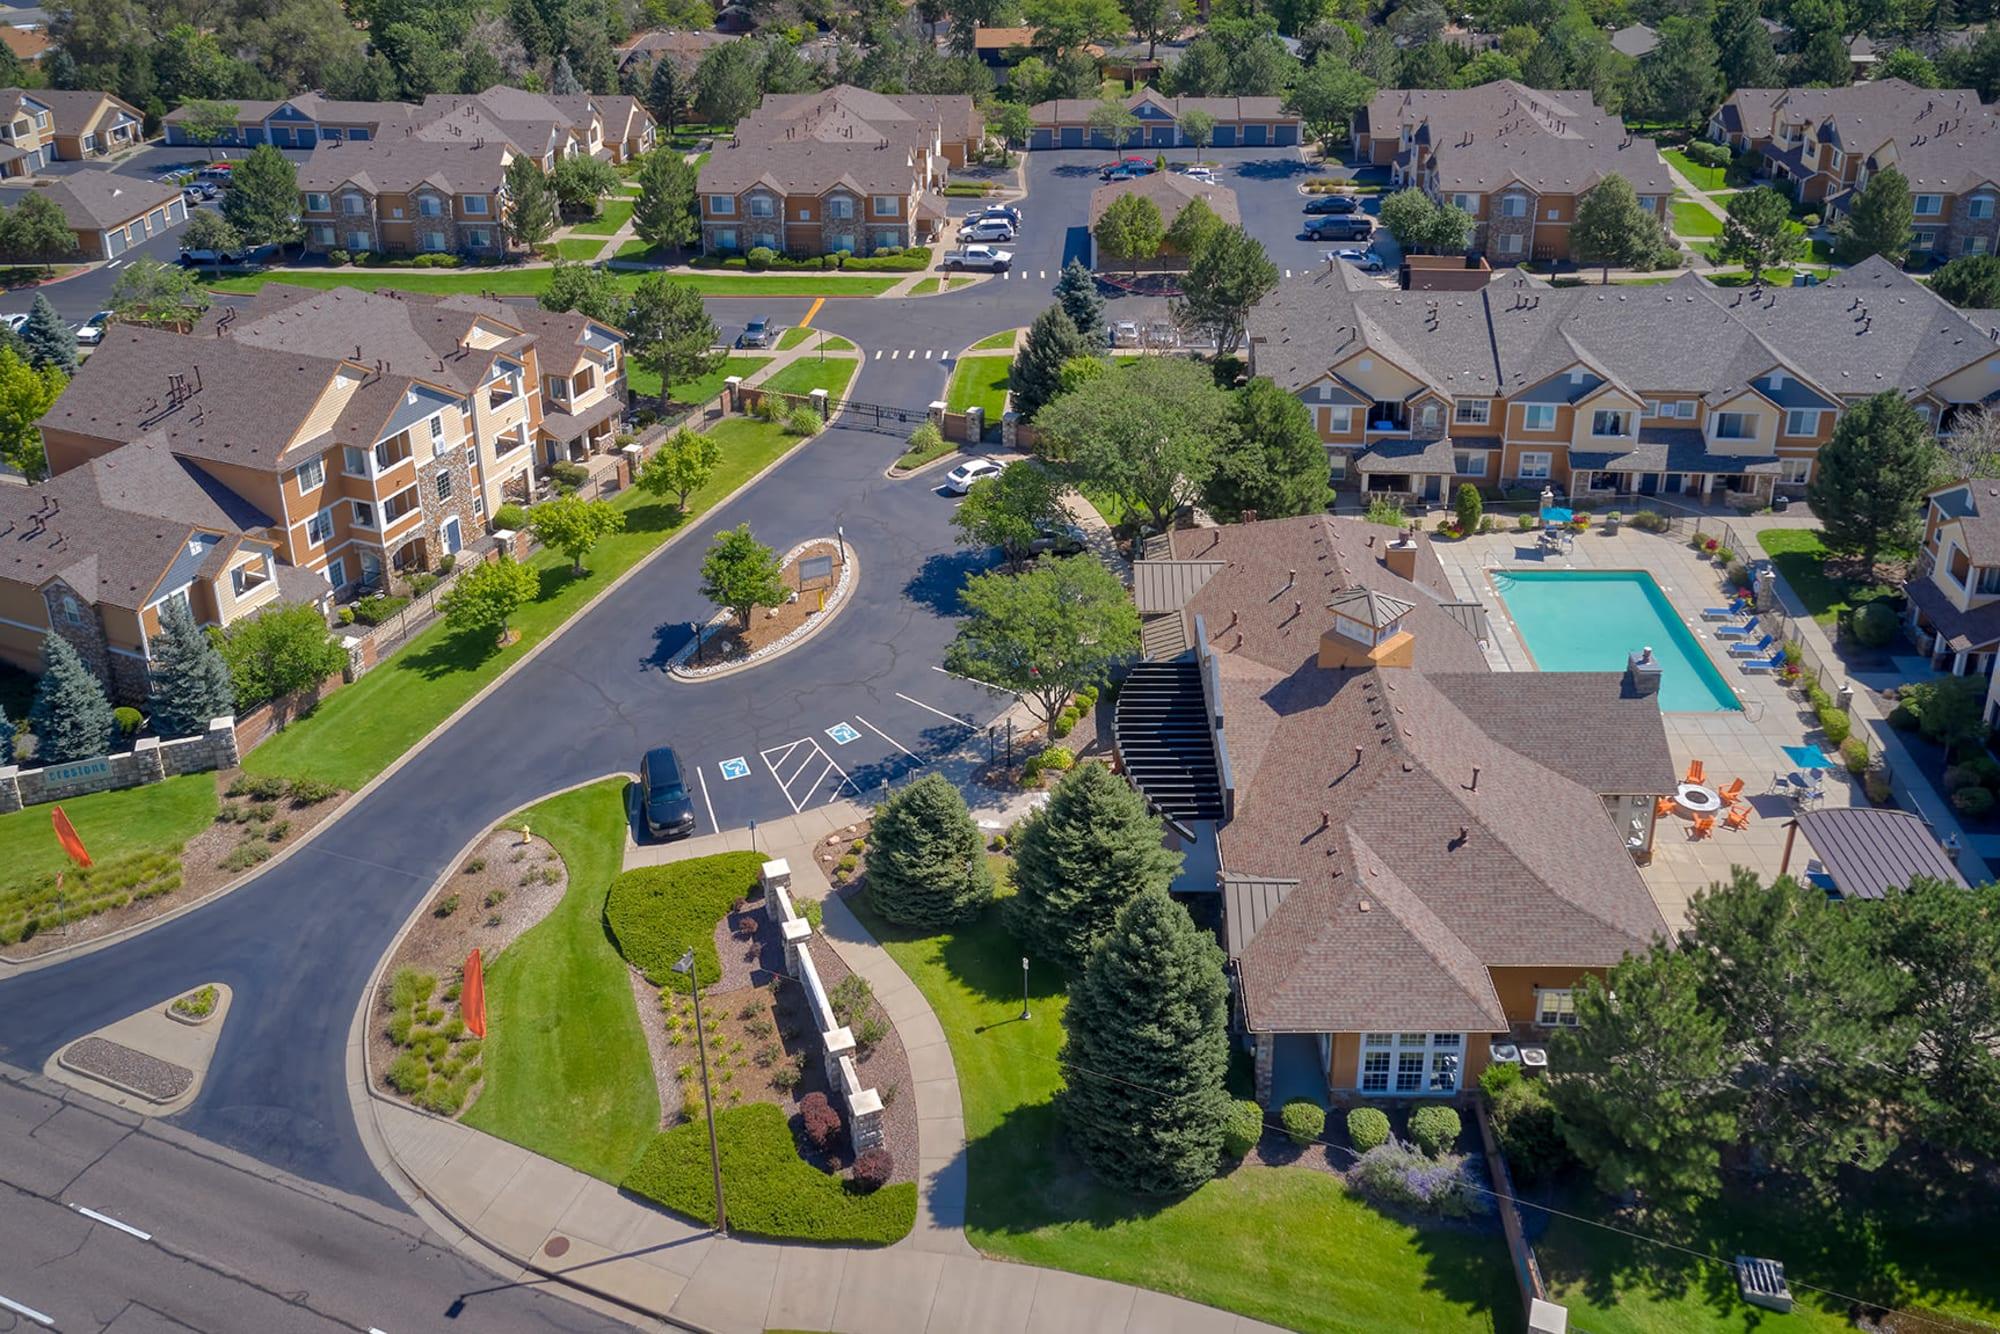 Ariel View of Property at Crestone Apartments in Aurora, Colorado